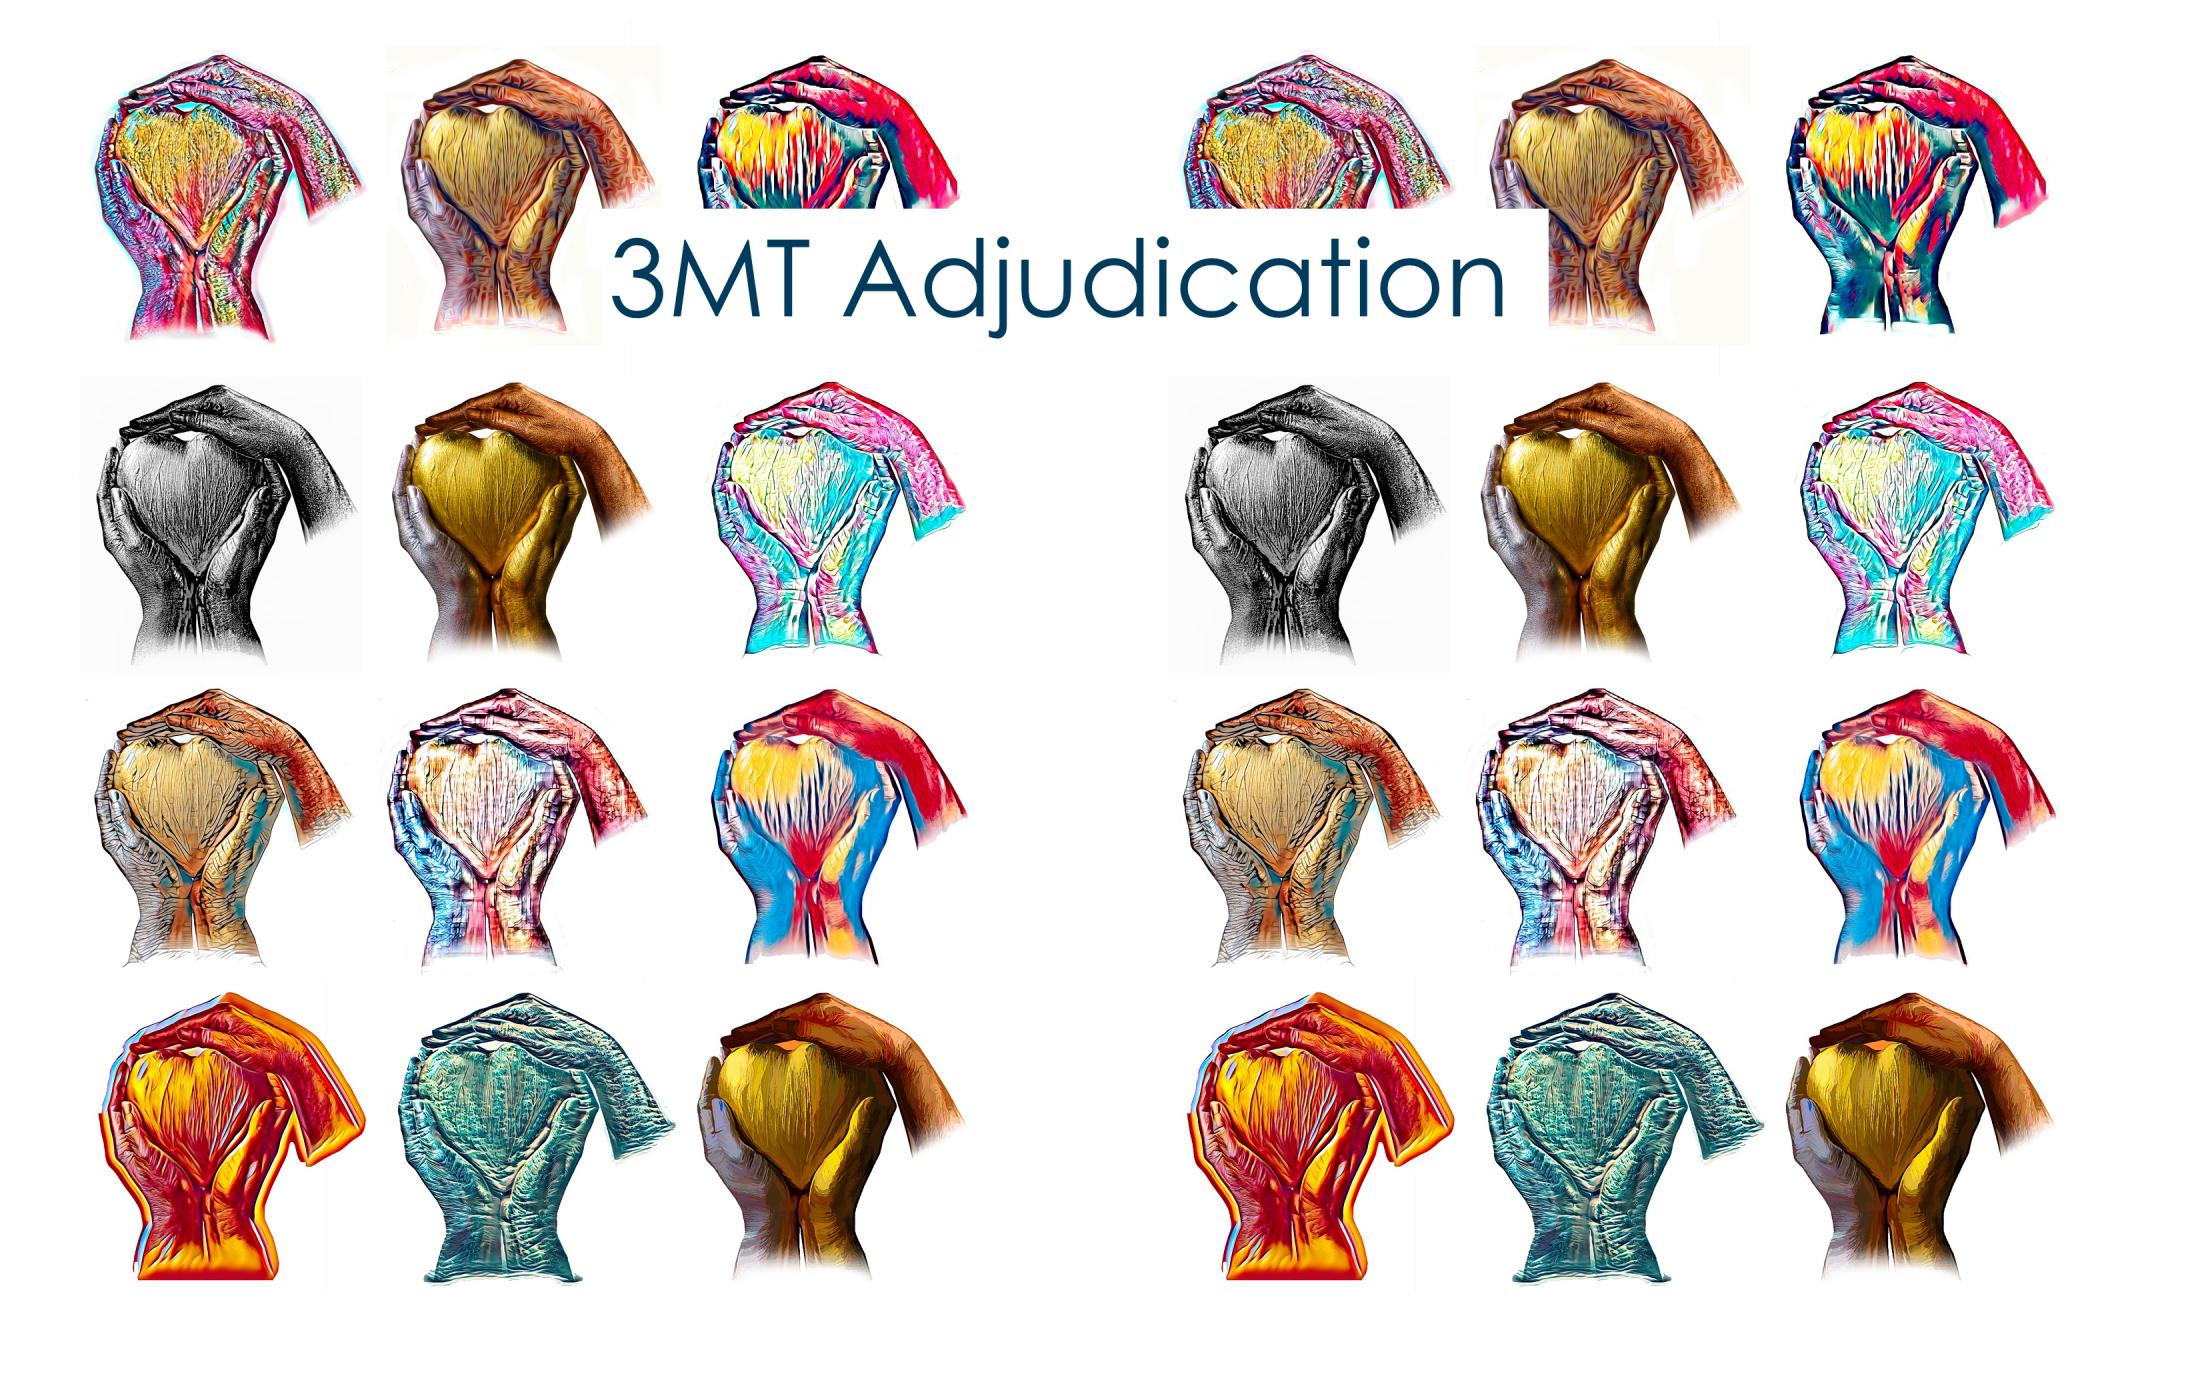 3MT adjudication